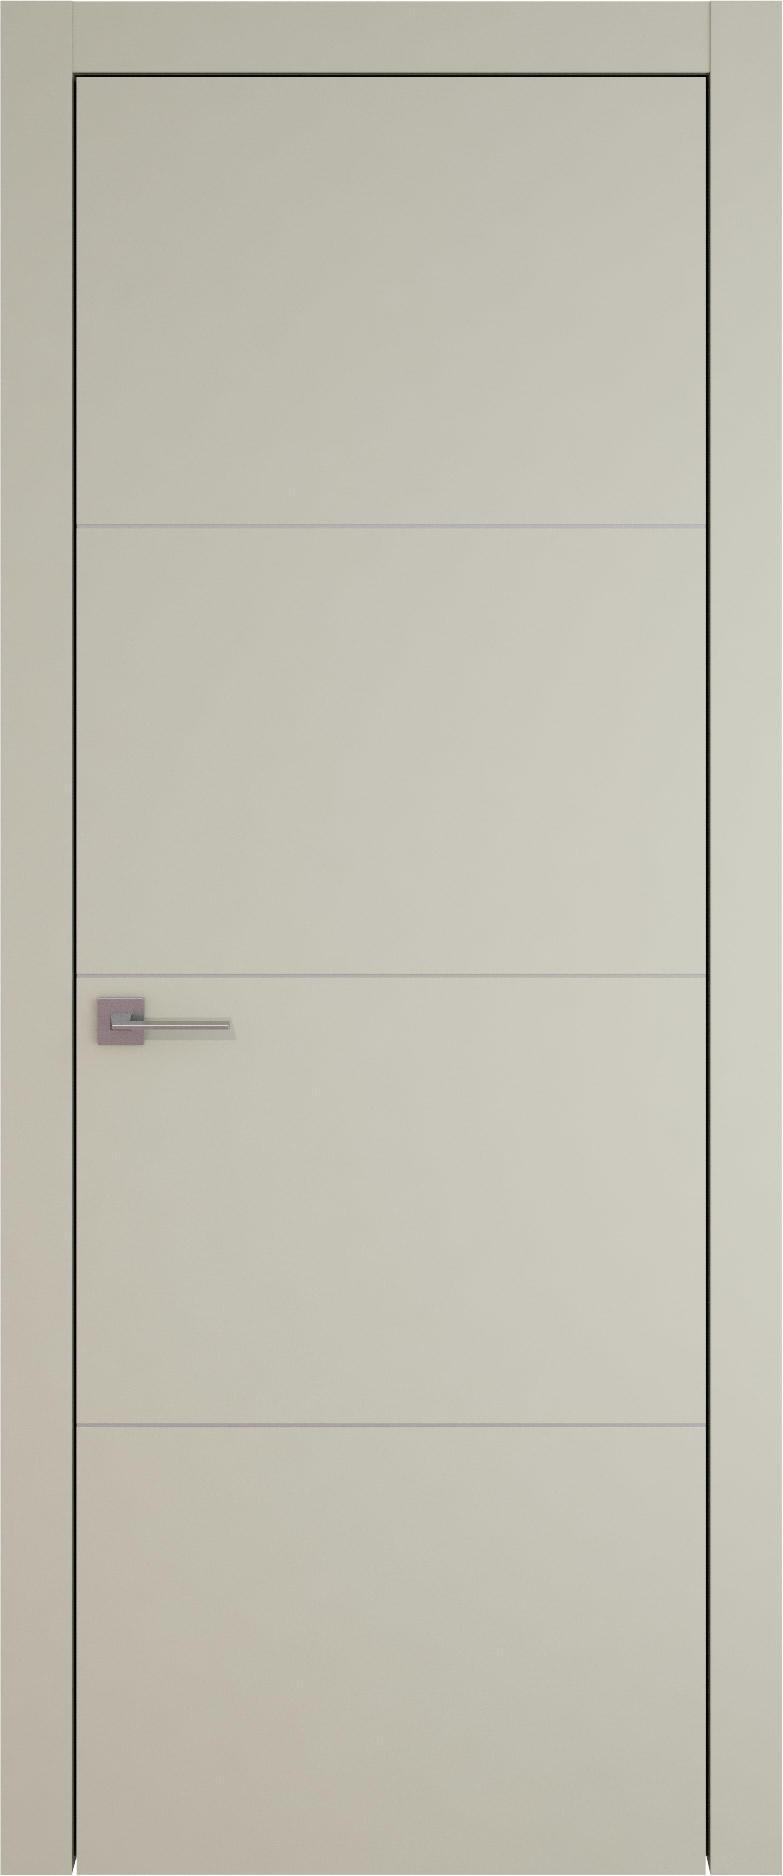 Tivoli Г-3 цвет - Серо-оливковая эмаль (RAL 7032) Без стекла (ДГ)